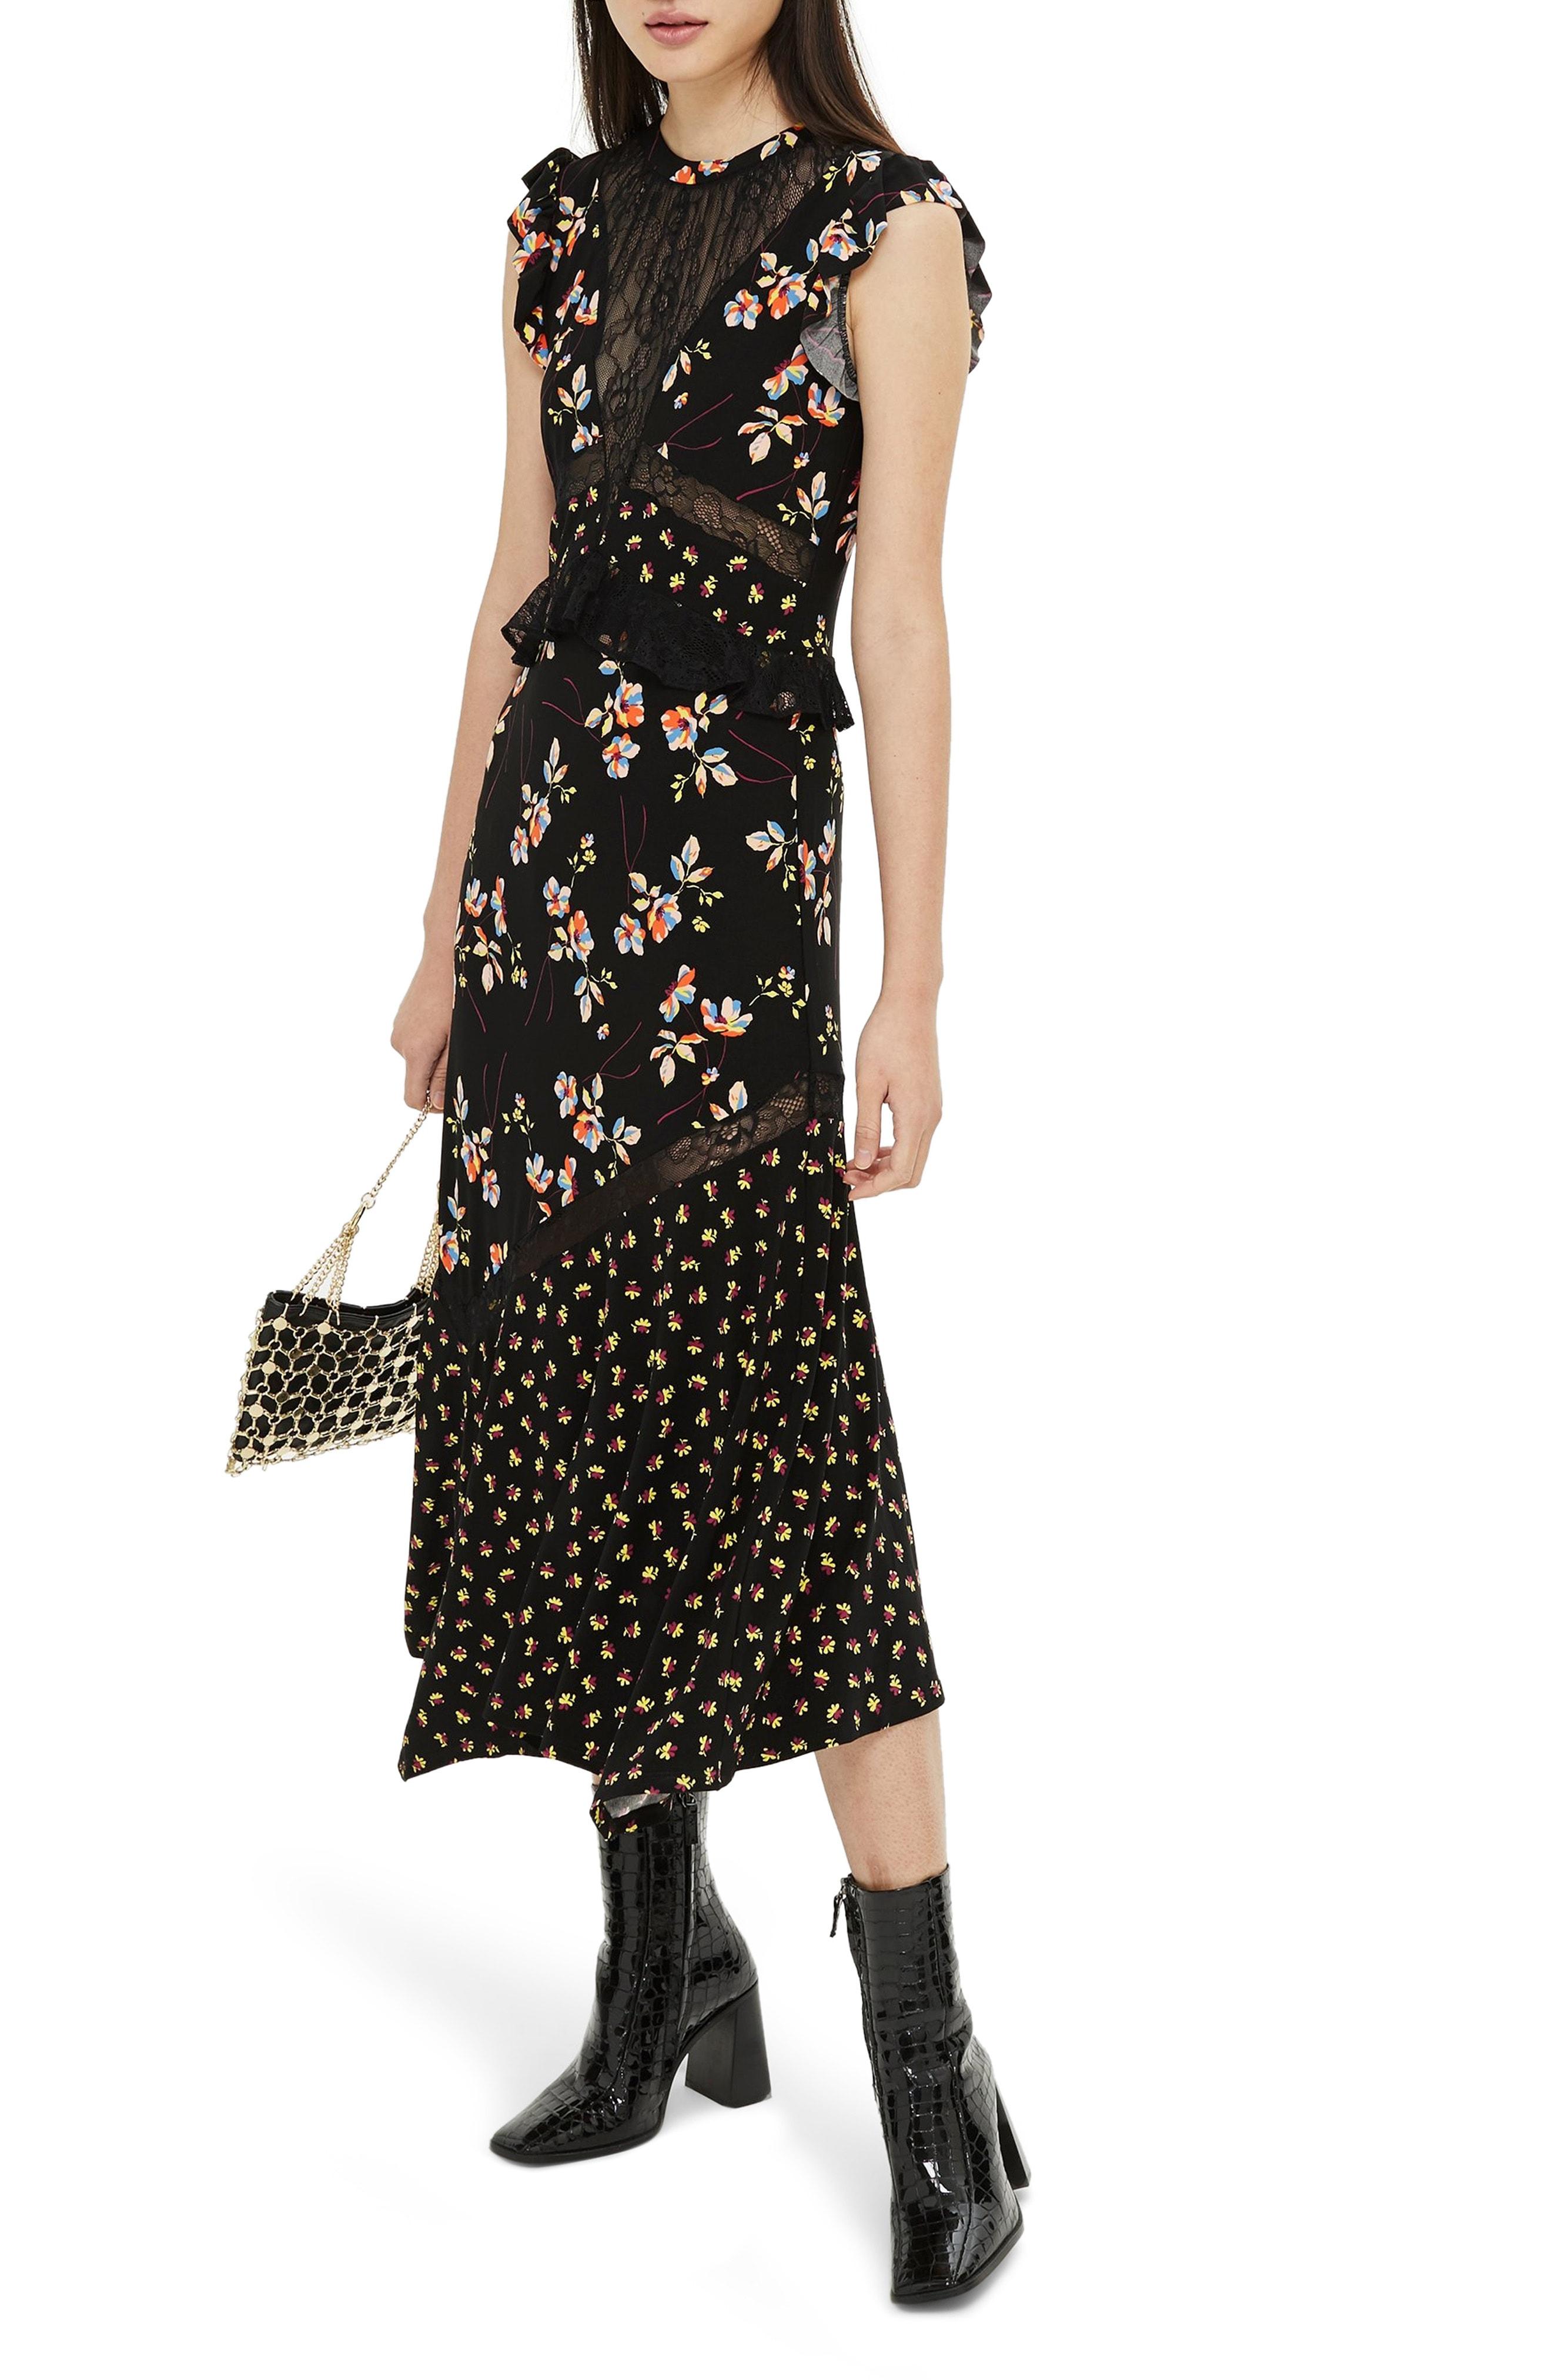 Topshop Lace Mix Spring Midi Dress